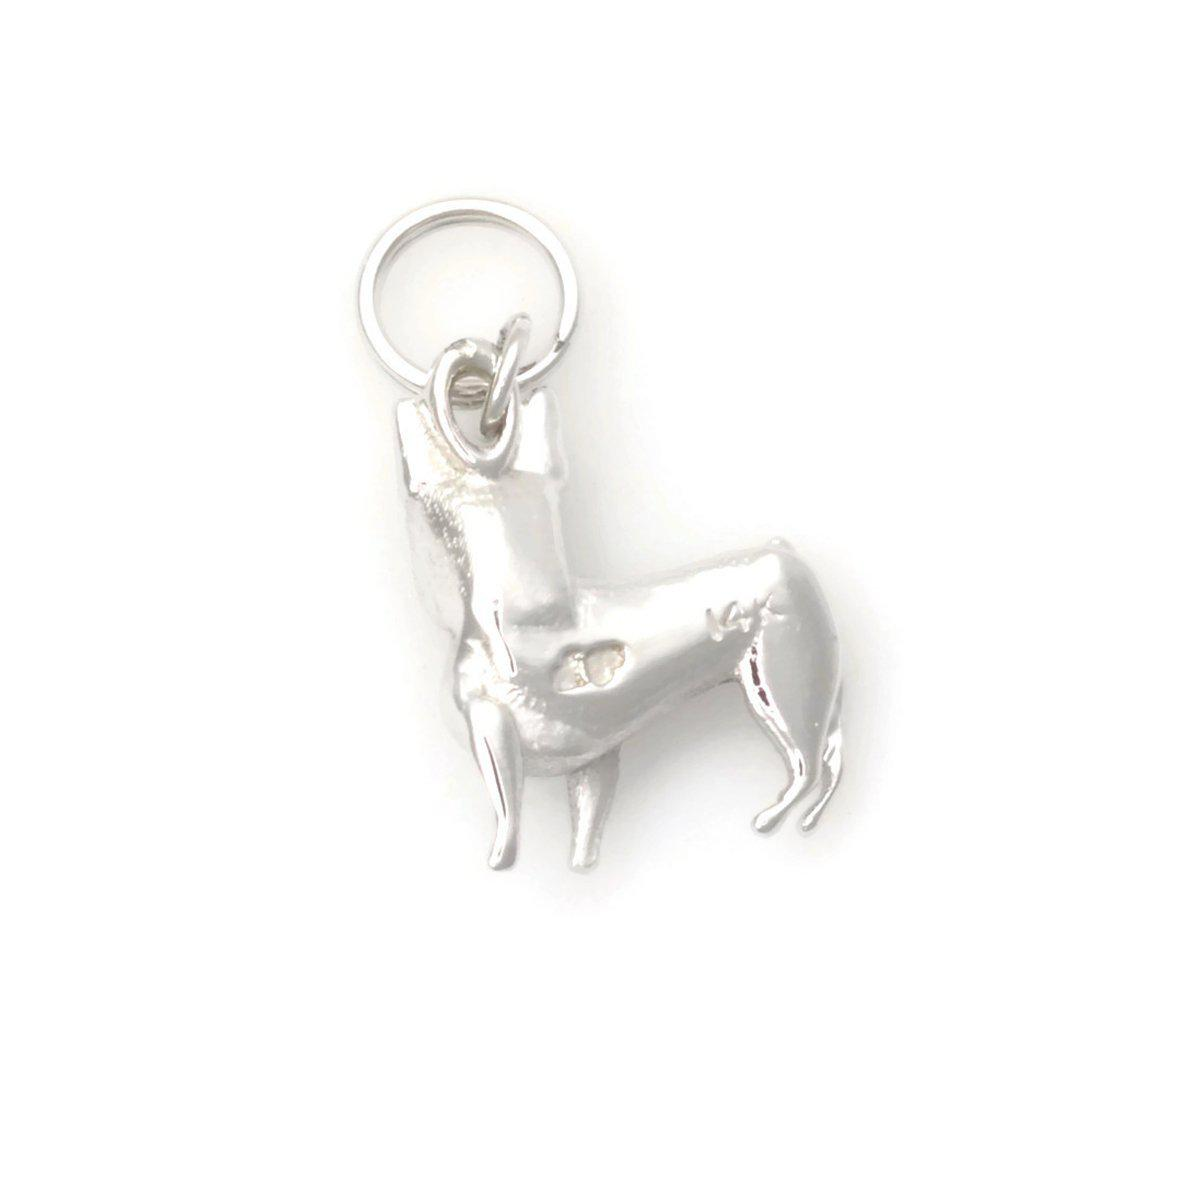 Donna Pizarro Designs 14kt White Gold French Bulldog Charm uyJsa5z